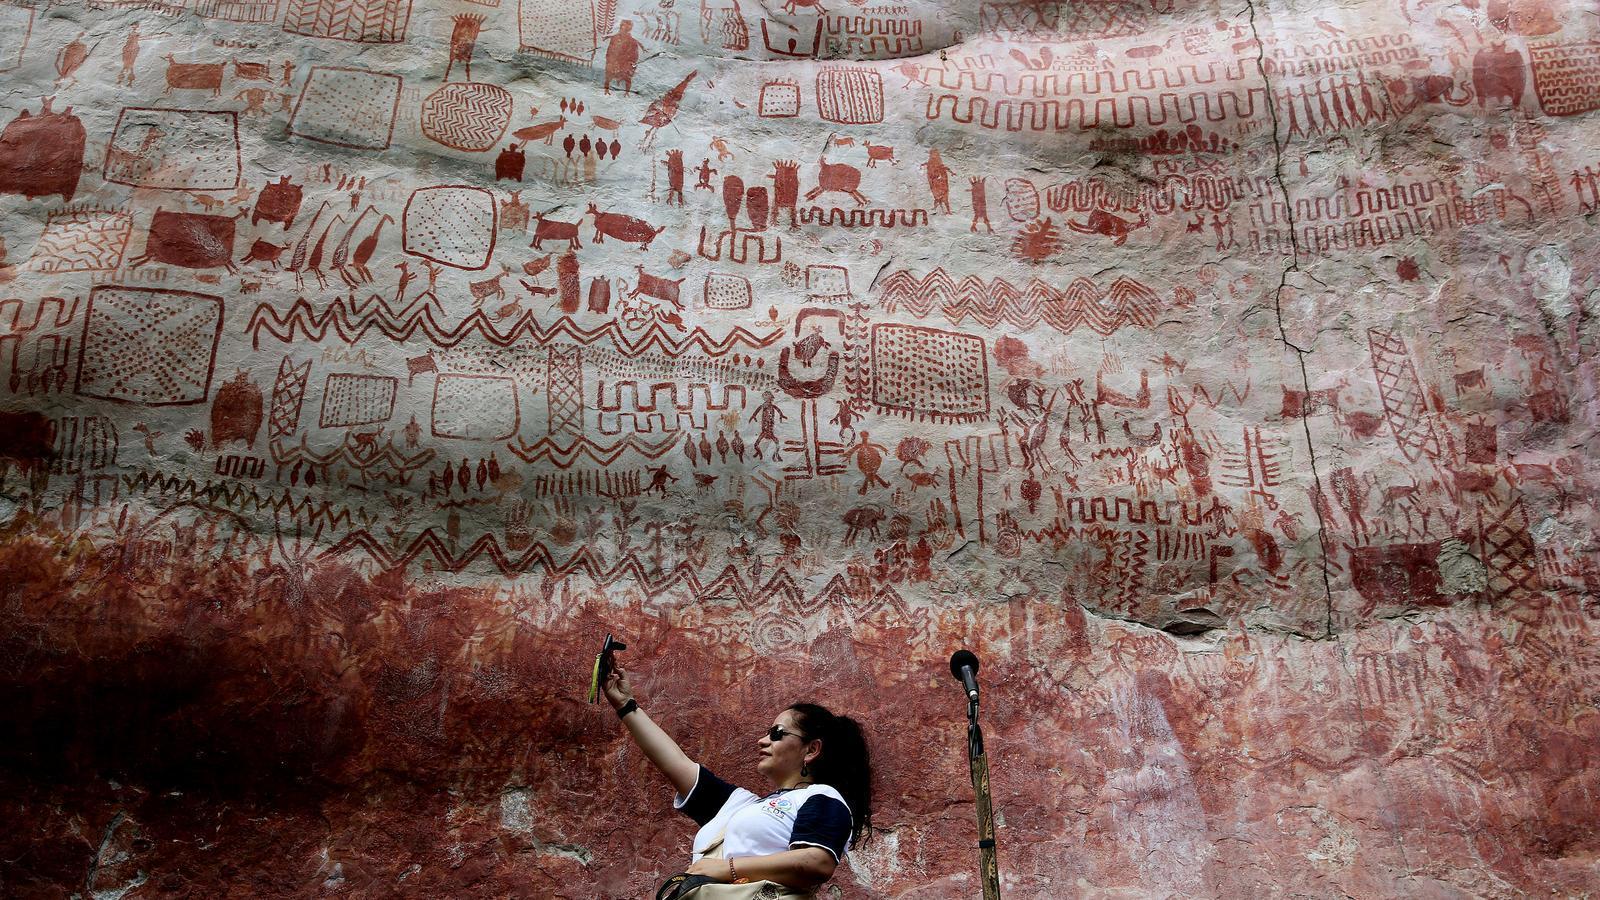 Pintures prehistòriques a Cerro Azul, Colòmbia